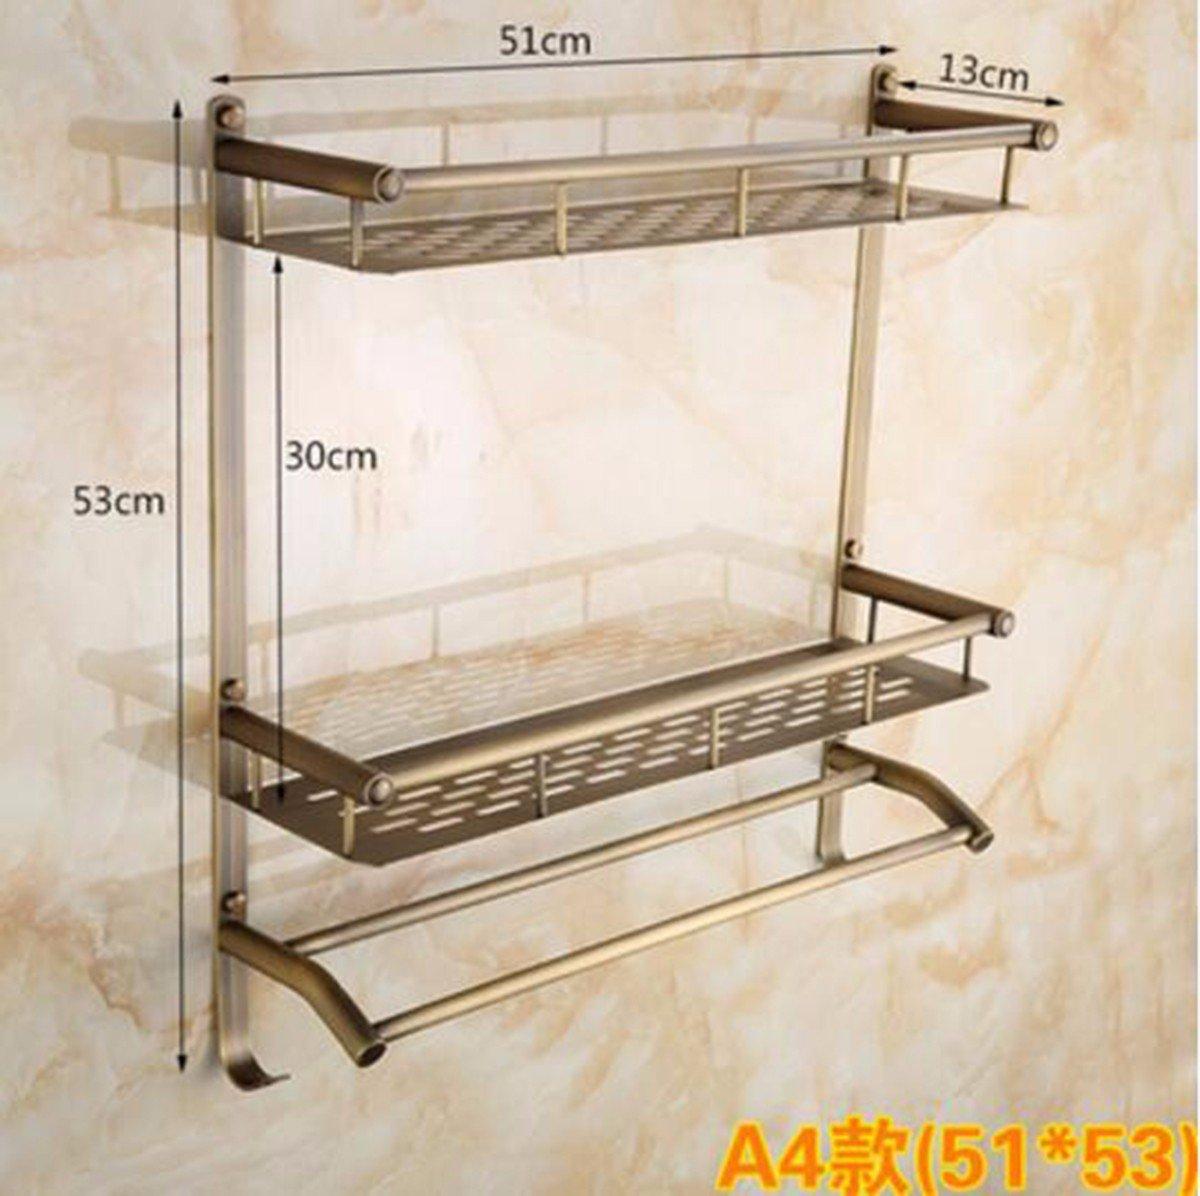 SJQKA Towel rack The Whole European Antique Copper Double Bathroom Shelf Cosmetic Rack Hook Towel Rack,A4